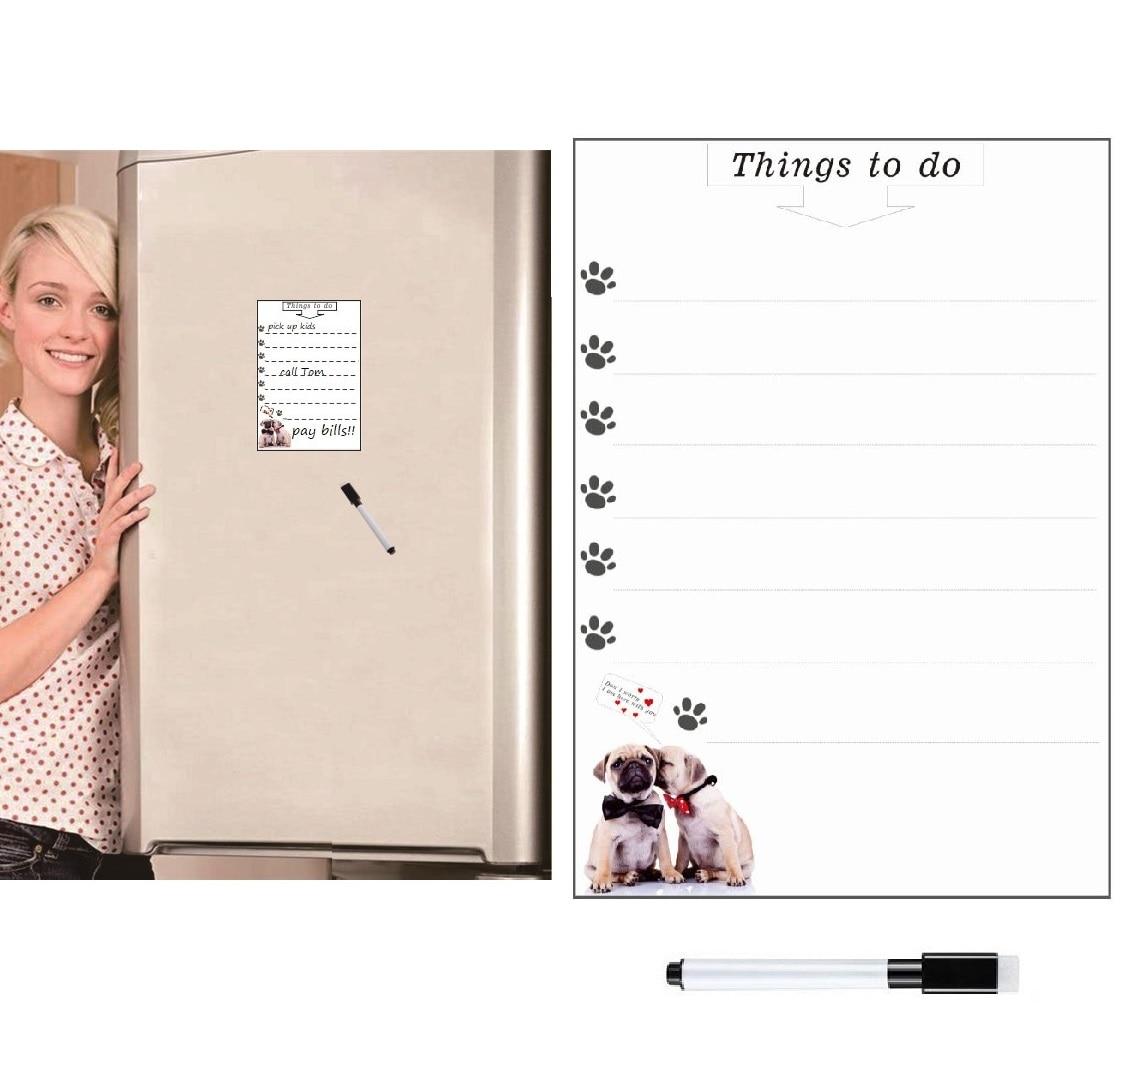 Dry Erase Magnetic Whiteboard White Board For Fridge Magnet Sticker Weekly Planner To Do List Cute Dog Message Board Marker Pen